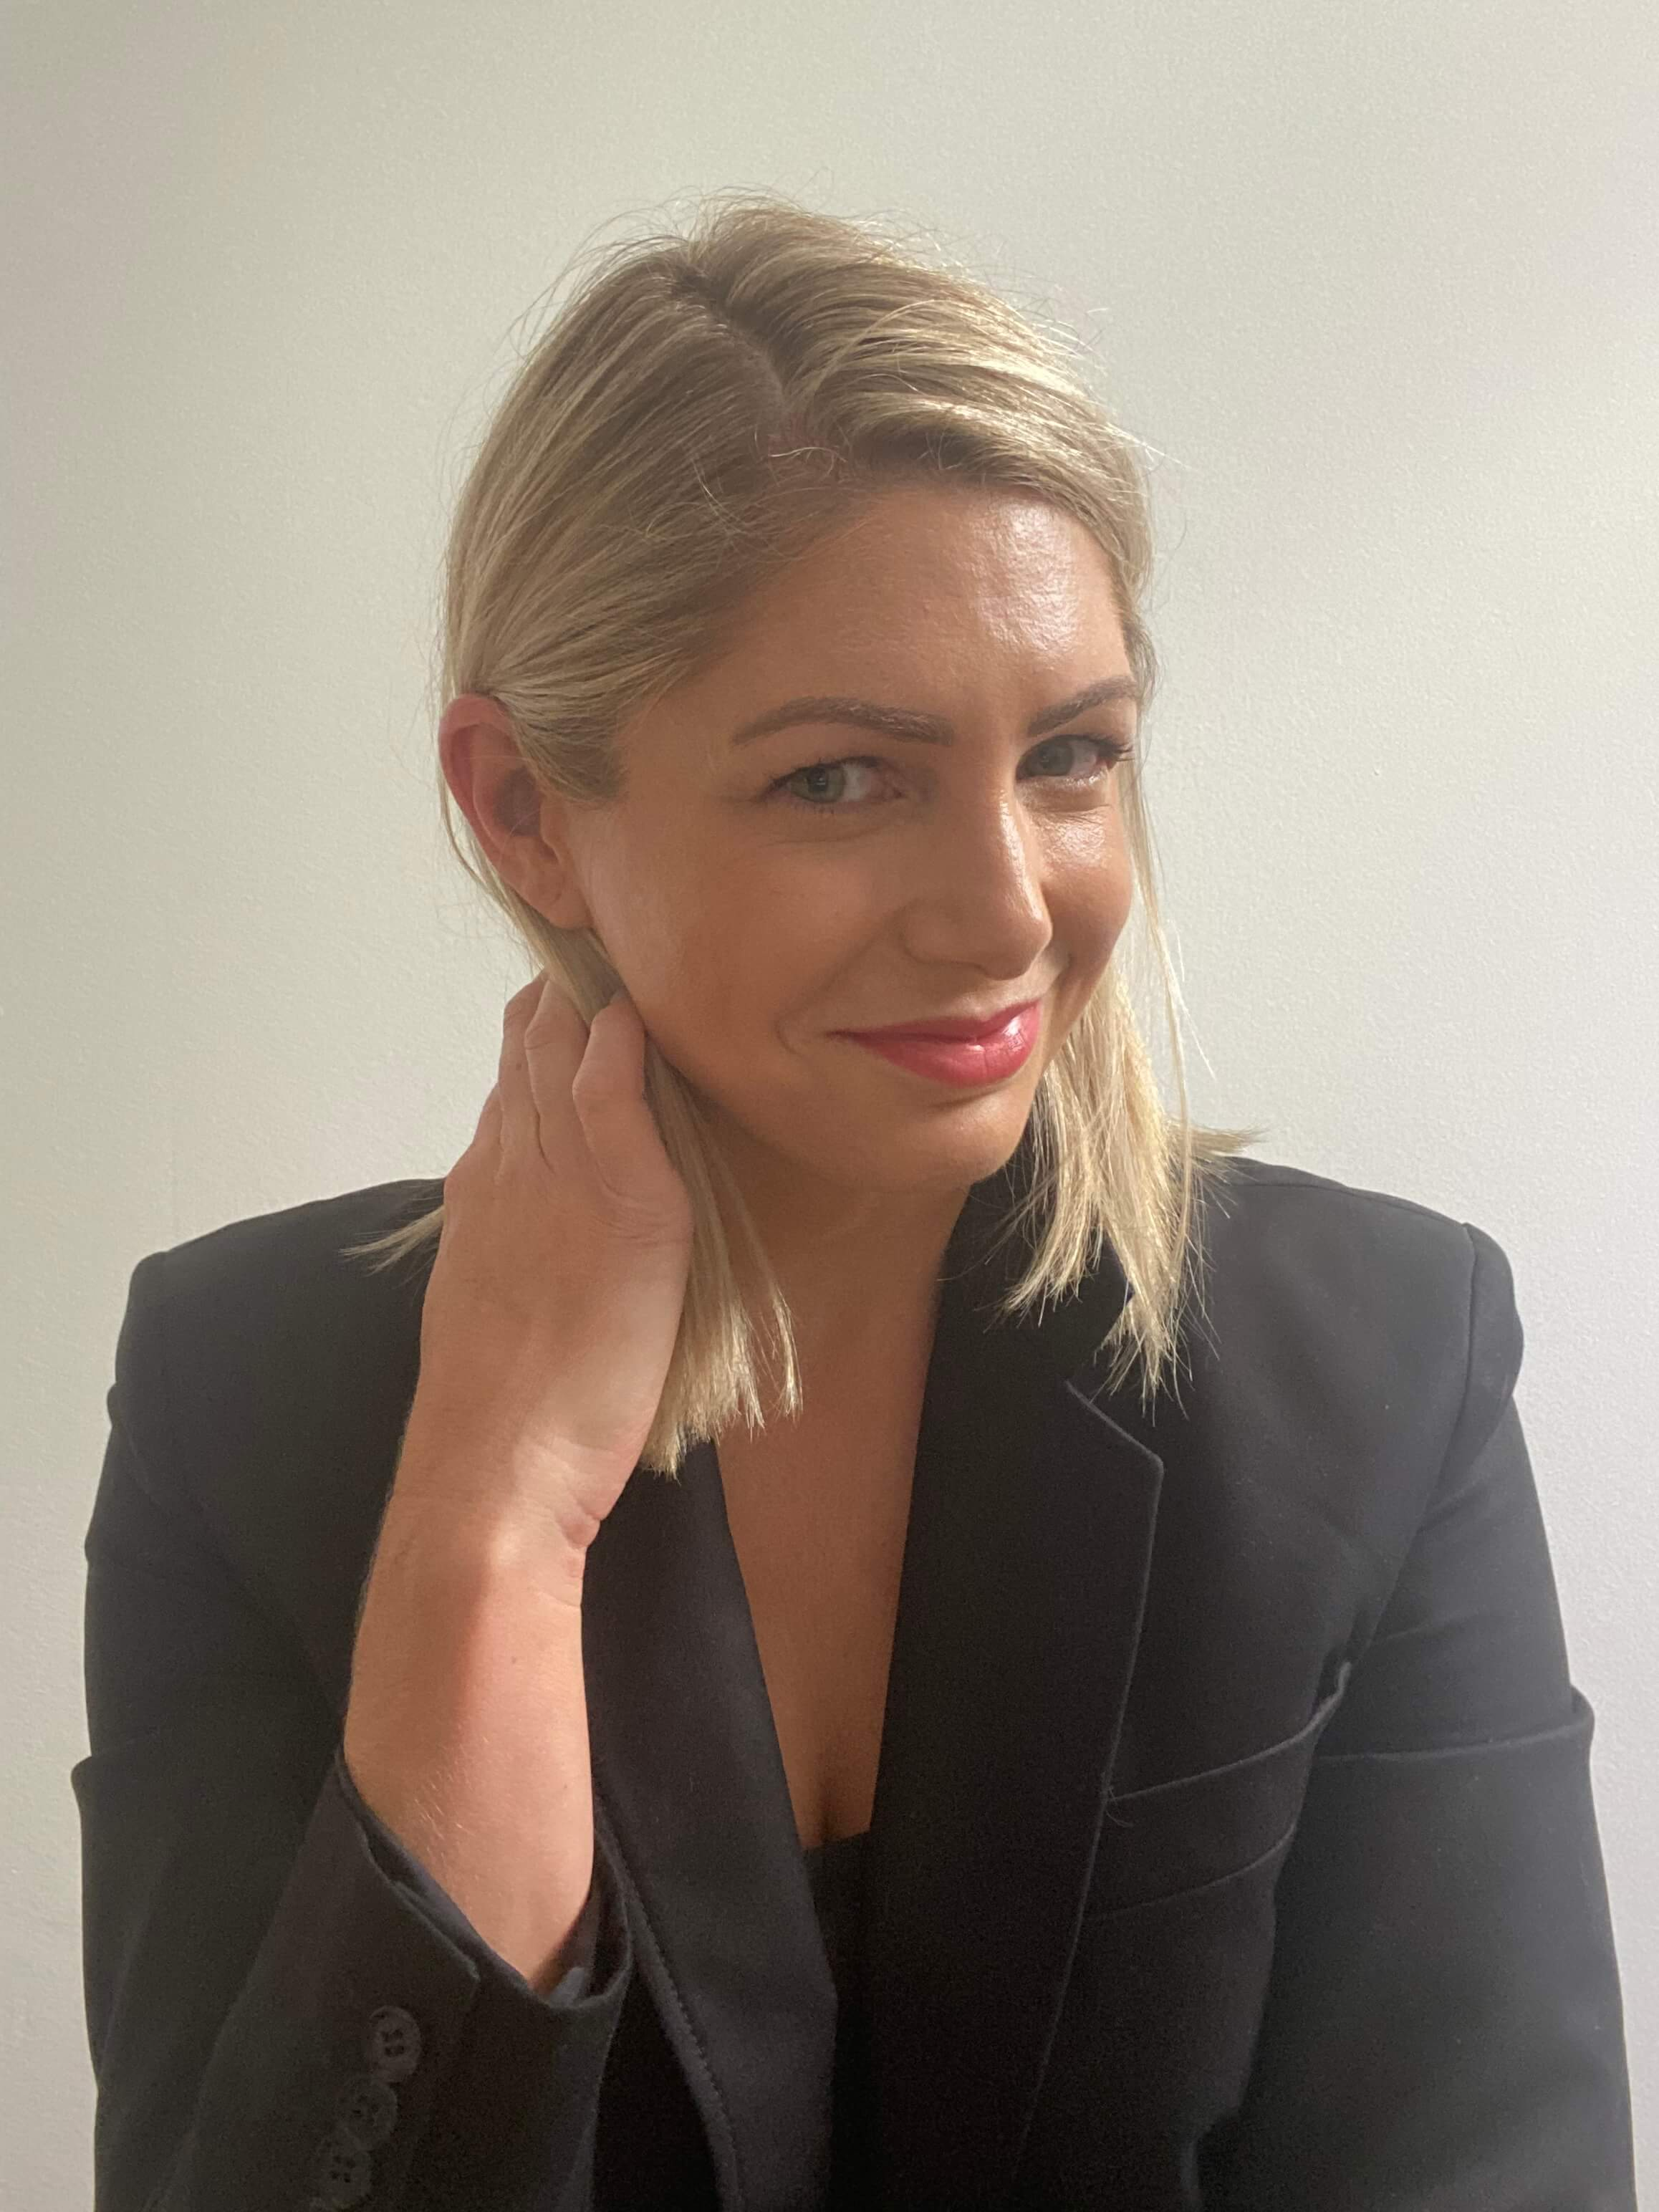 Sarah Townson Headshot Photograph